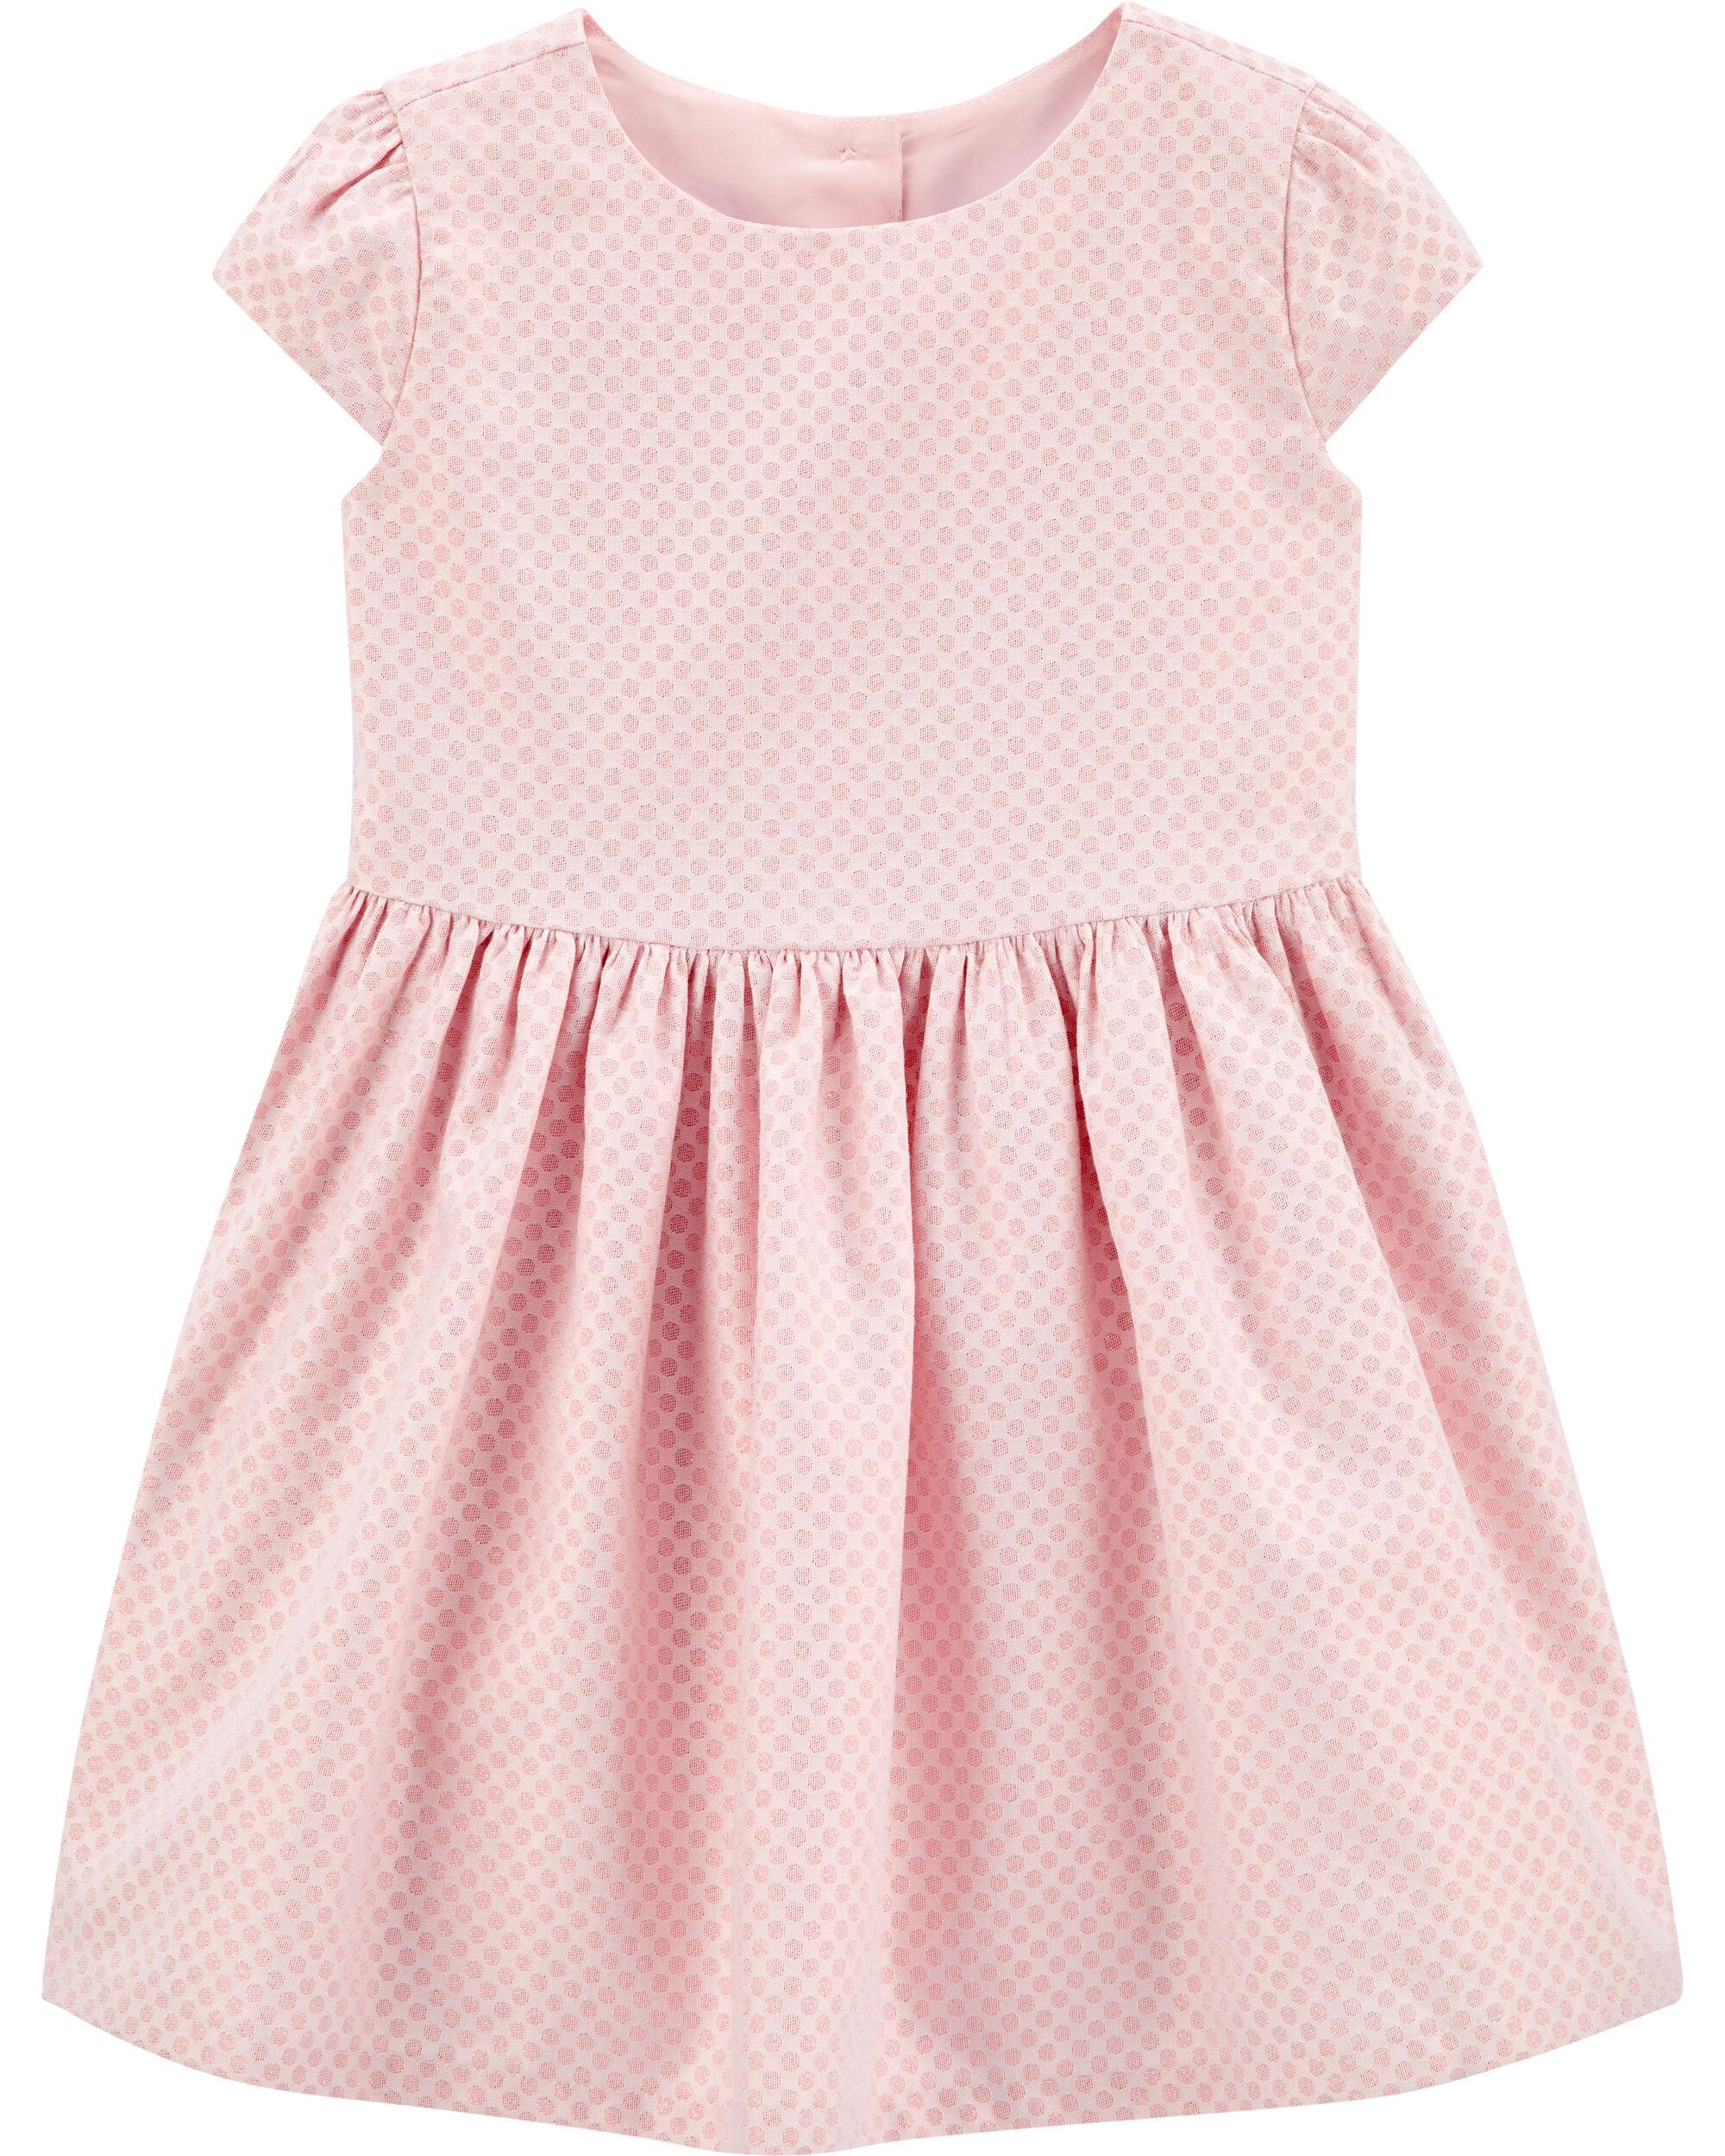 *Clearance*  Polka Dot Jacquard Dress